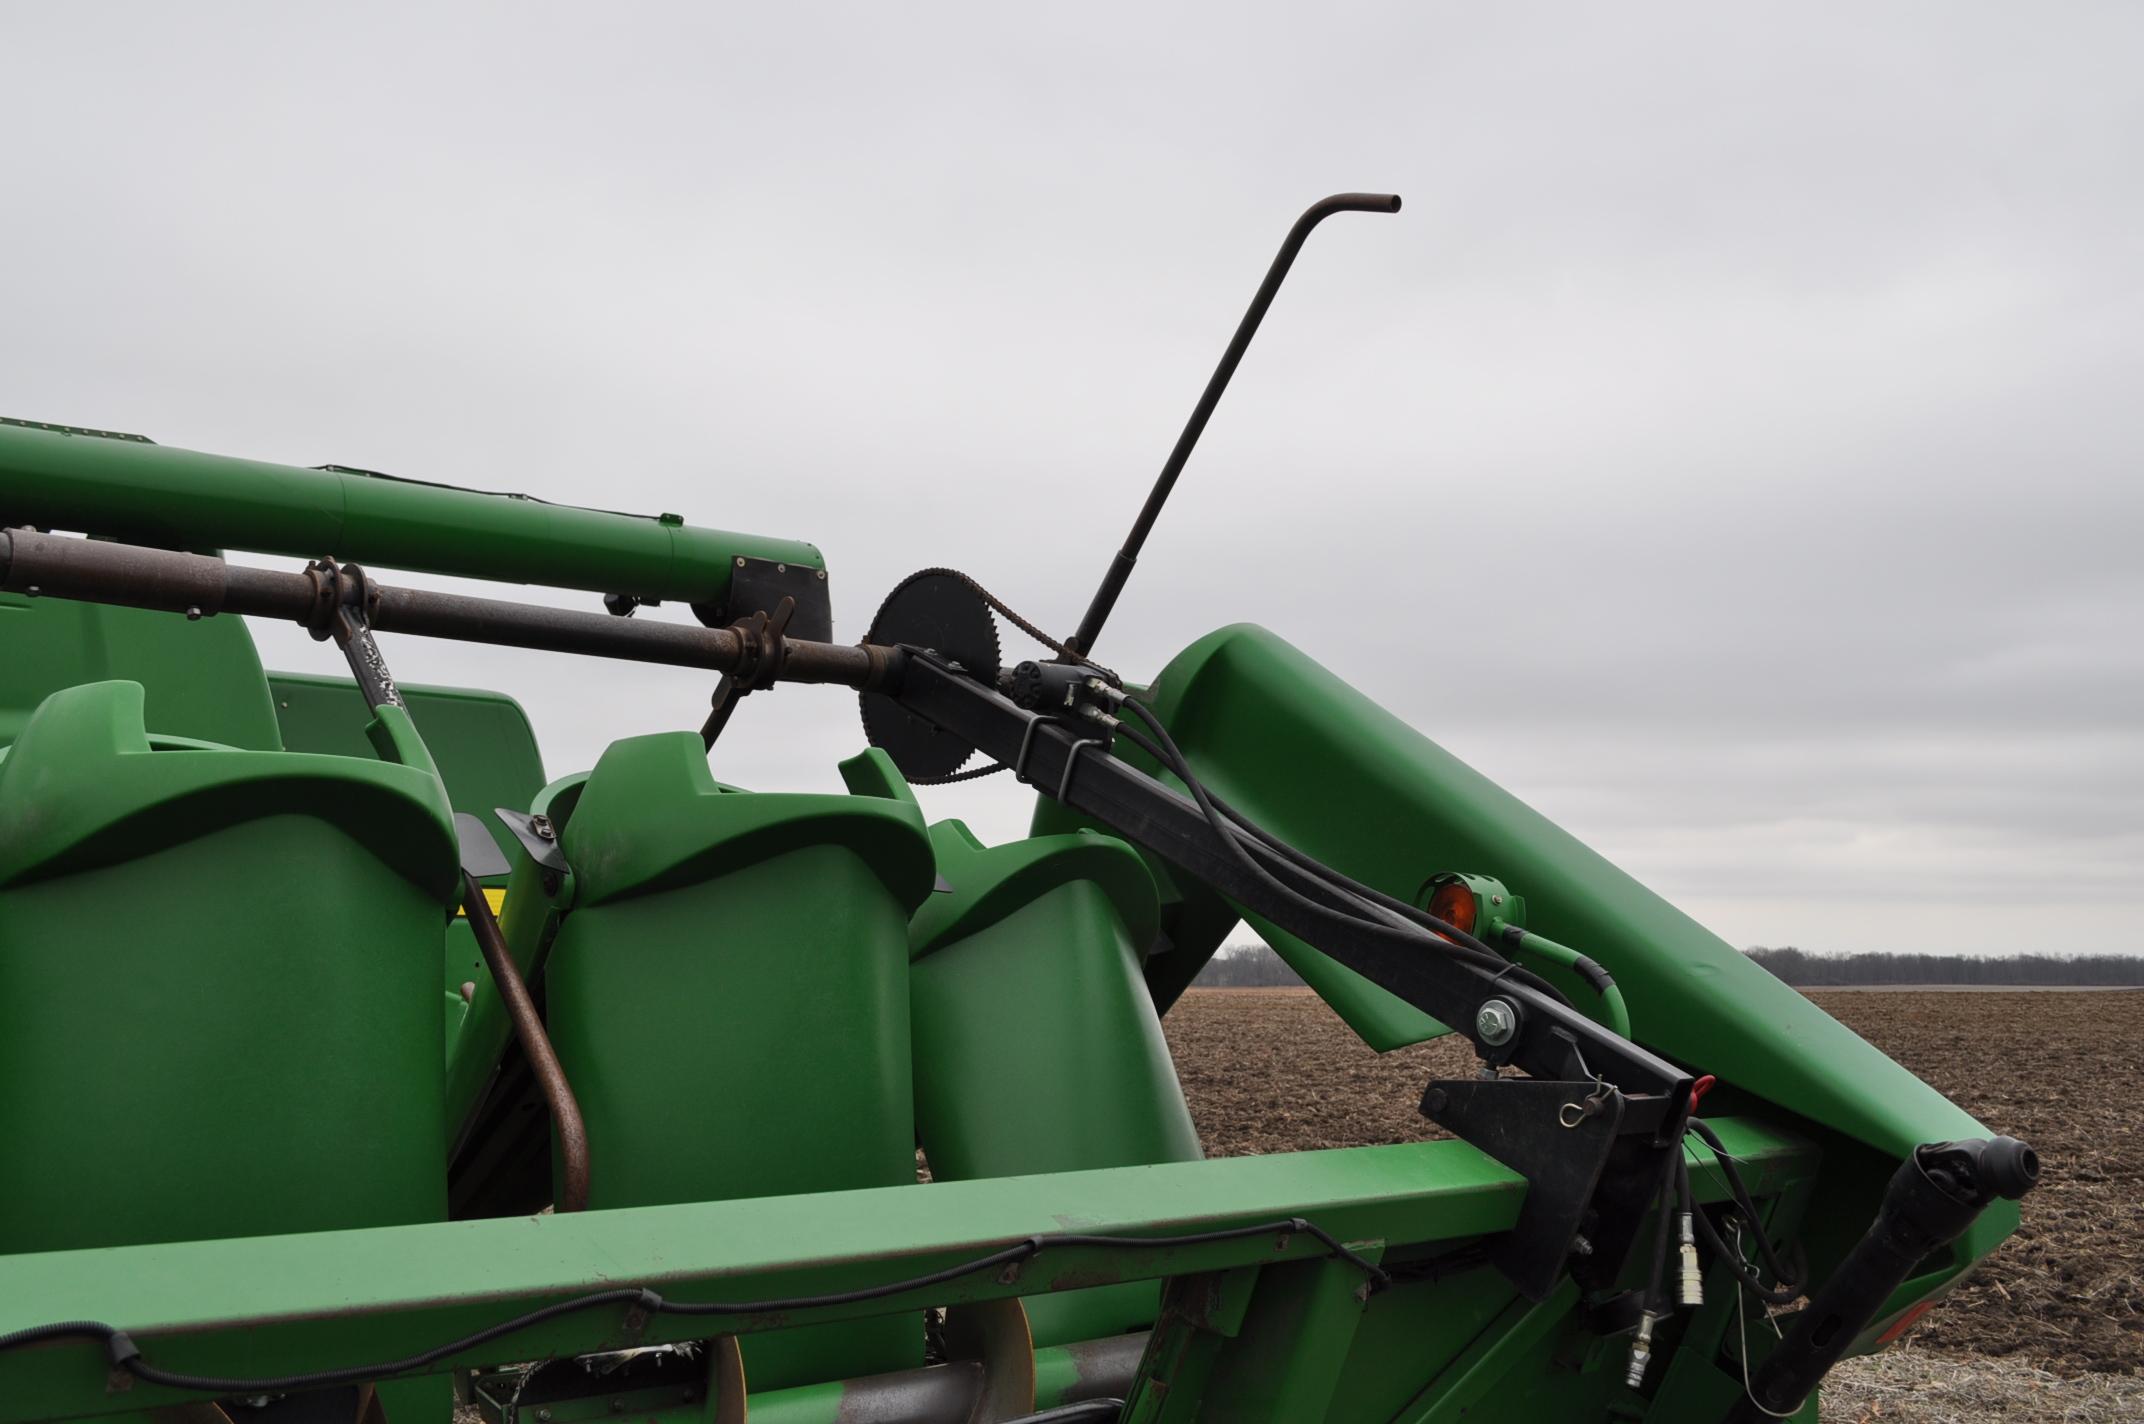 John Deere 693 corn head, poly, hyd drive, down corn reel, pto shafts, SN 655654 - Image 8 of 17